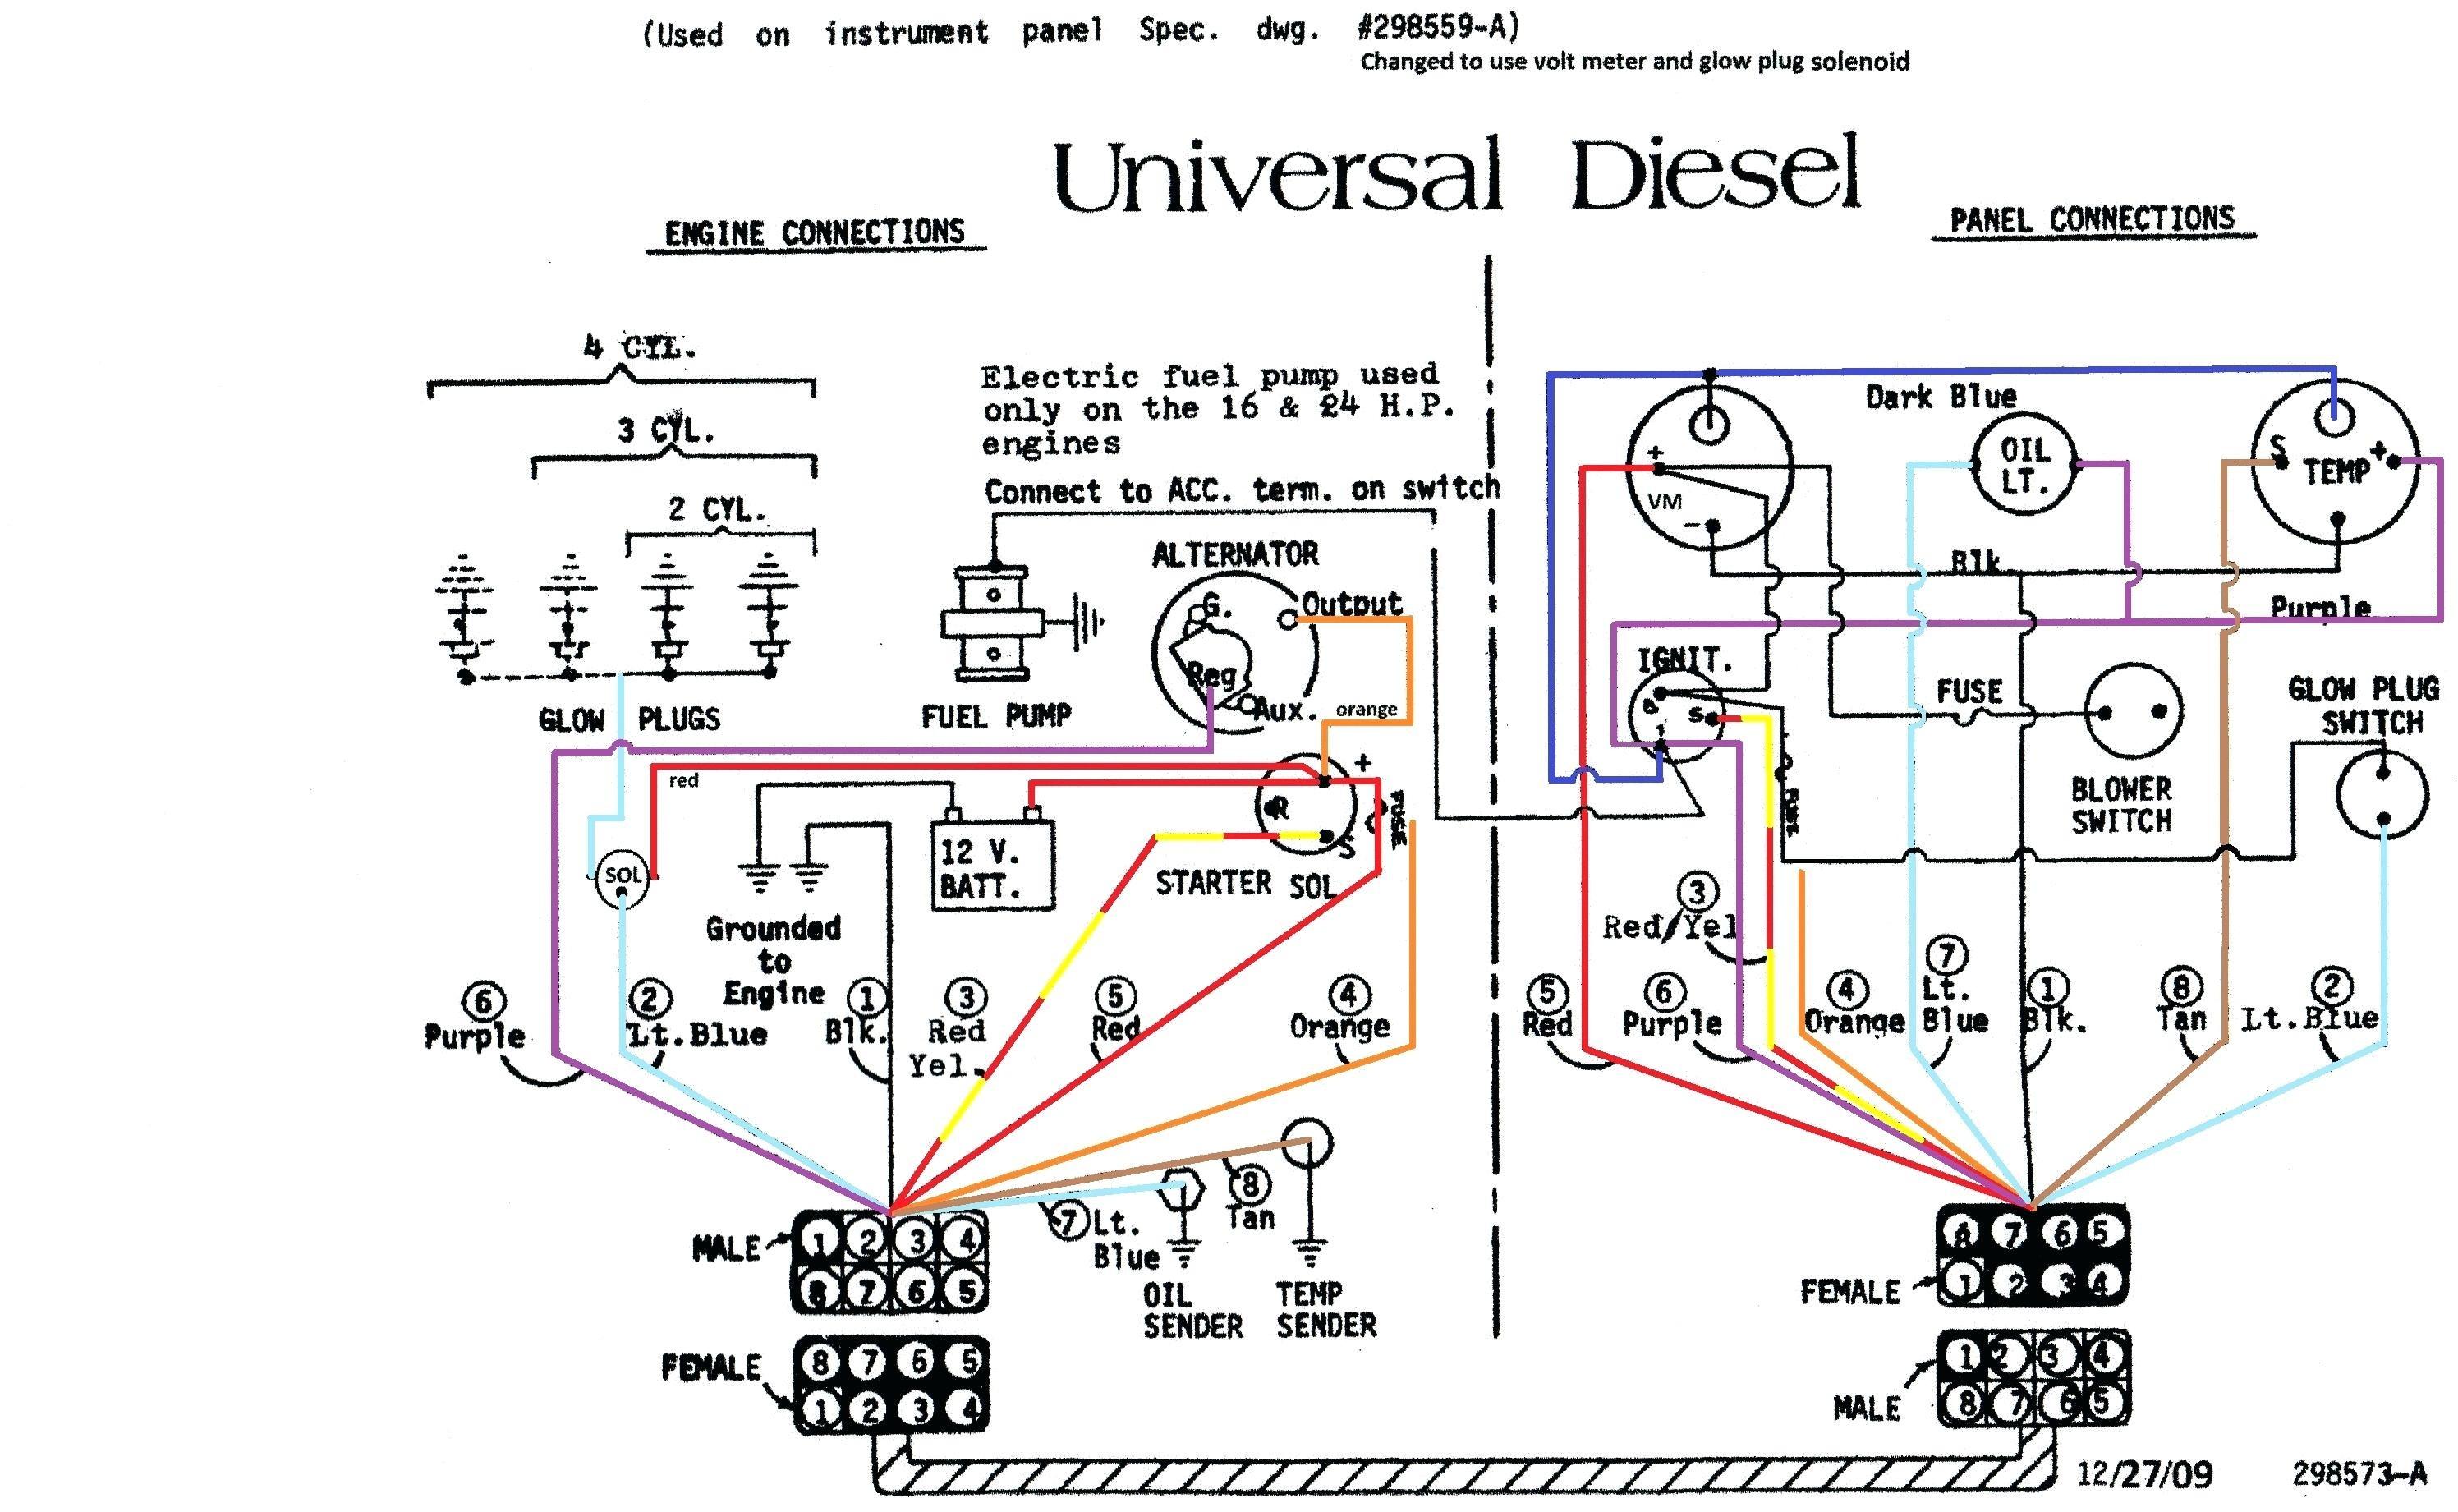 basic engine wiring diagram simple alternator wiring diagram for rh detoxicrecenze com Basic Headlight Wiring Diagram Basic House Wiring Diagrams